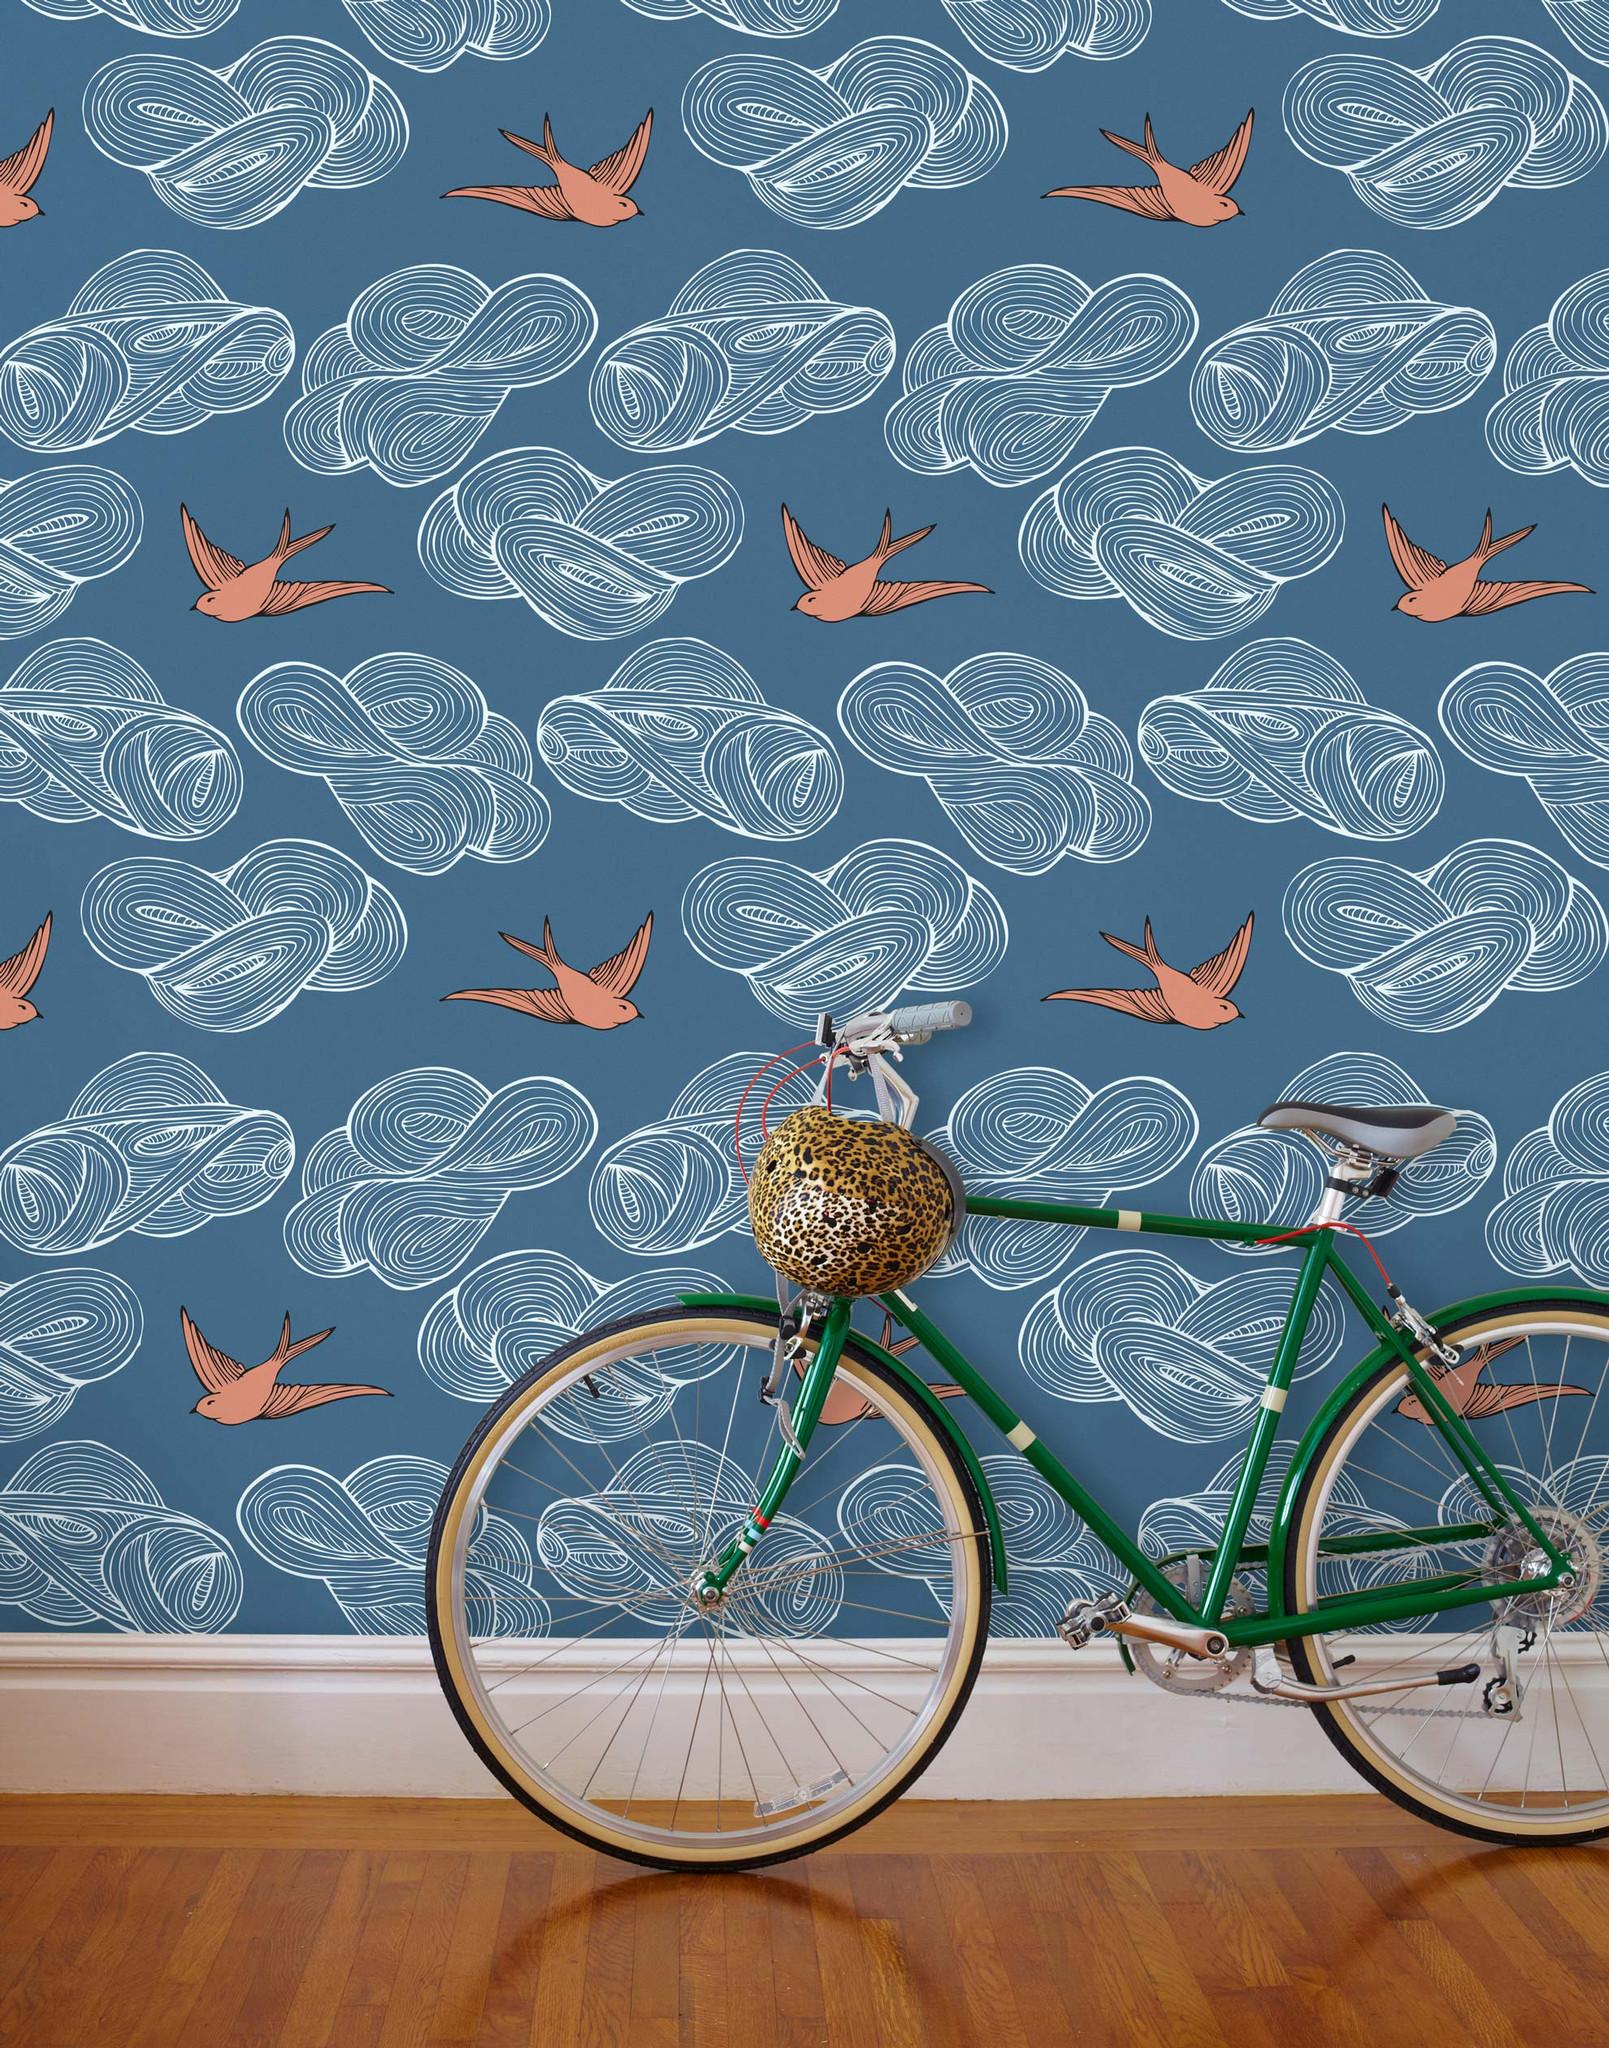 Drawn background daydream Daydream Wallpaper (Indigo) and Blue